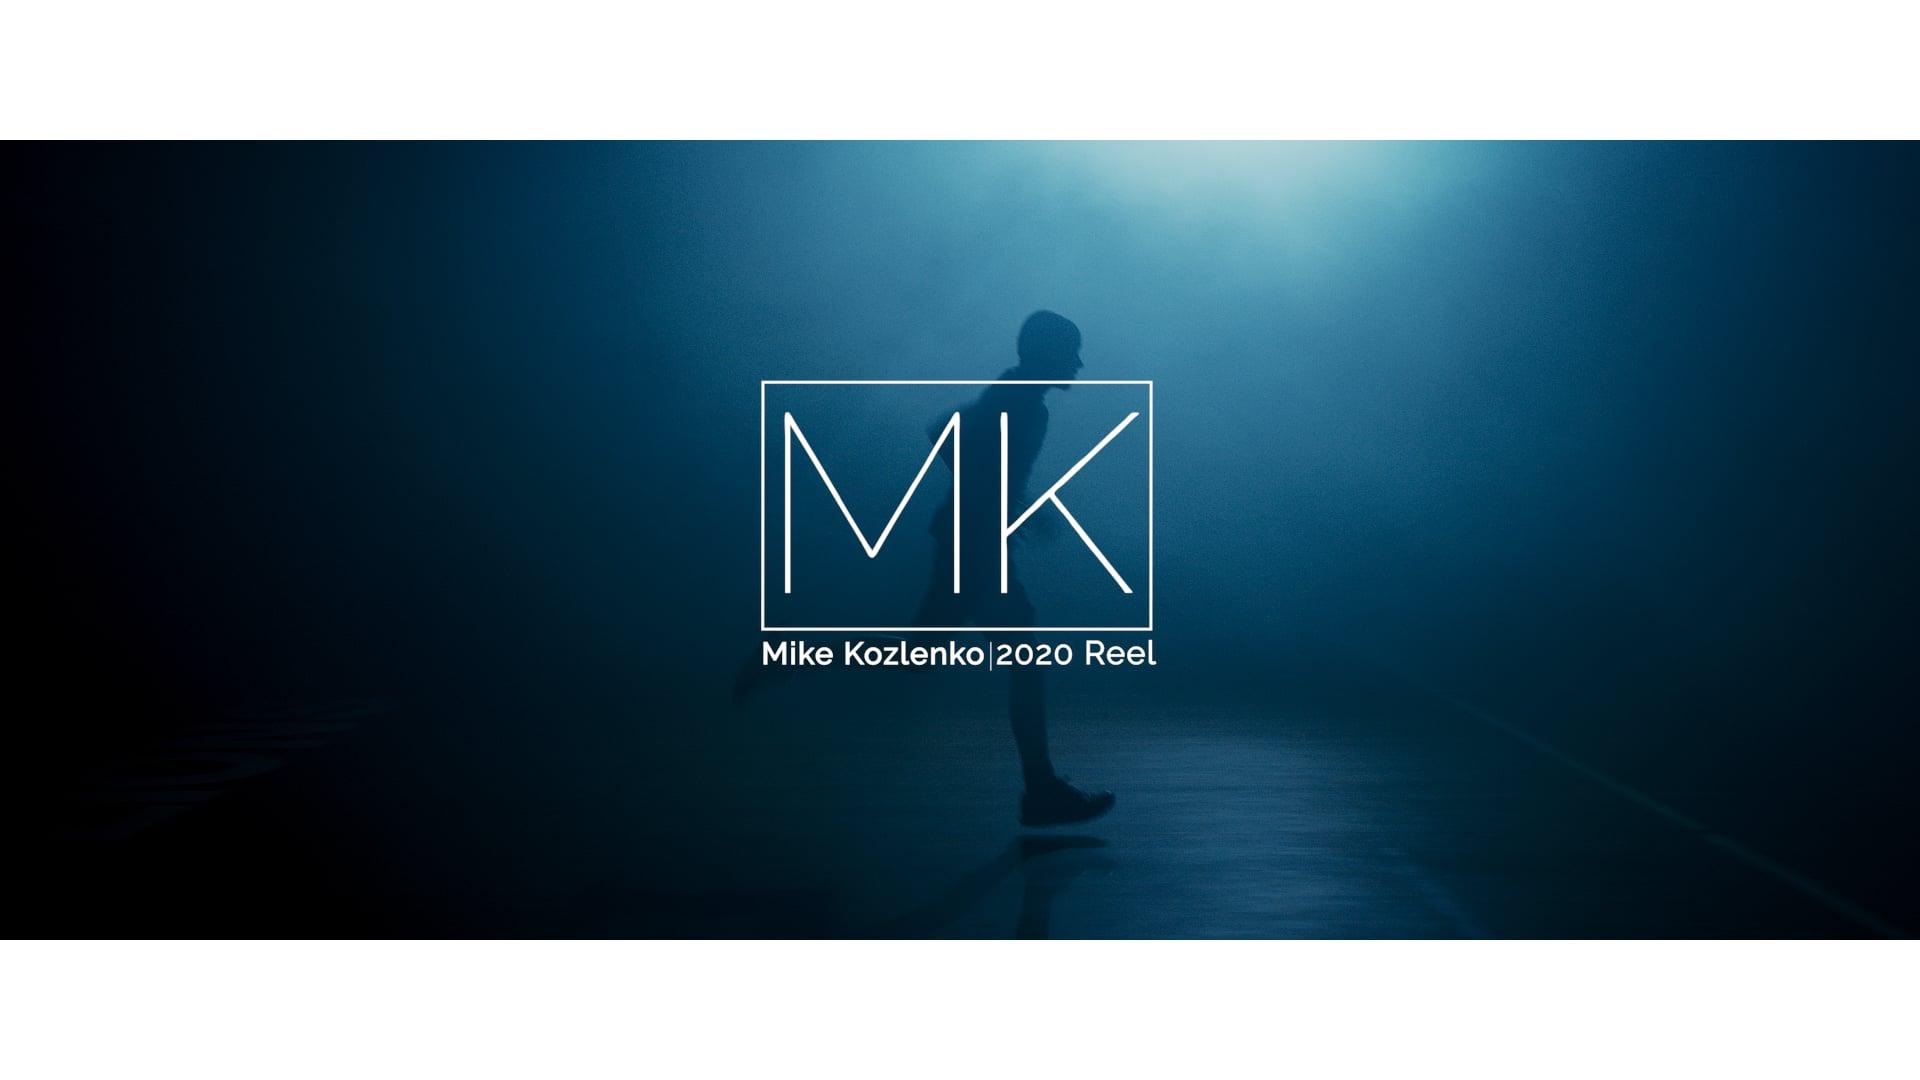 Mike Kozlenko | 2020 Reel